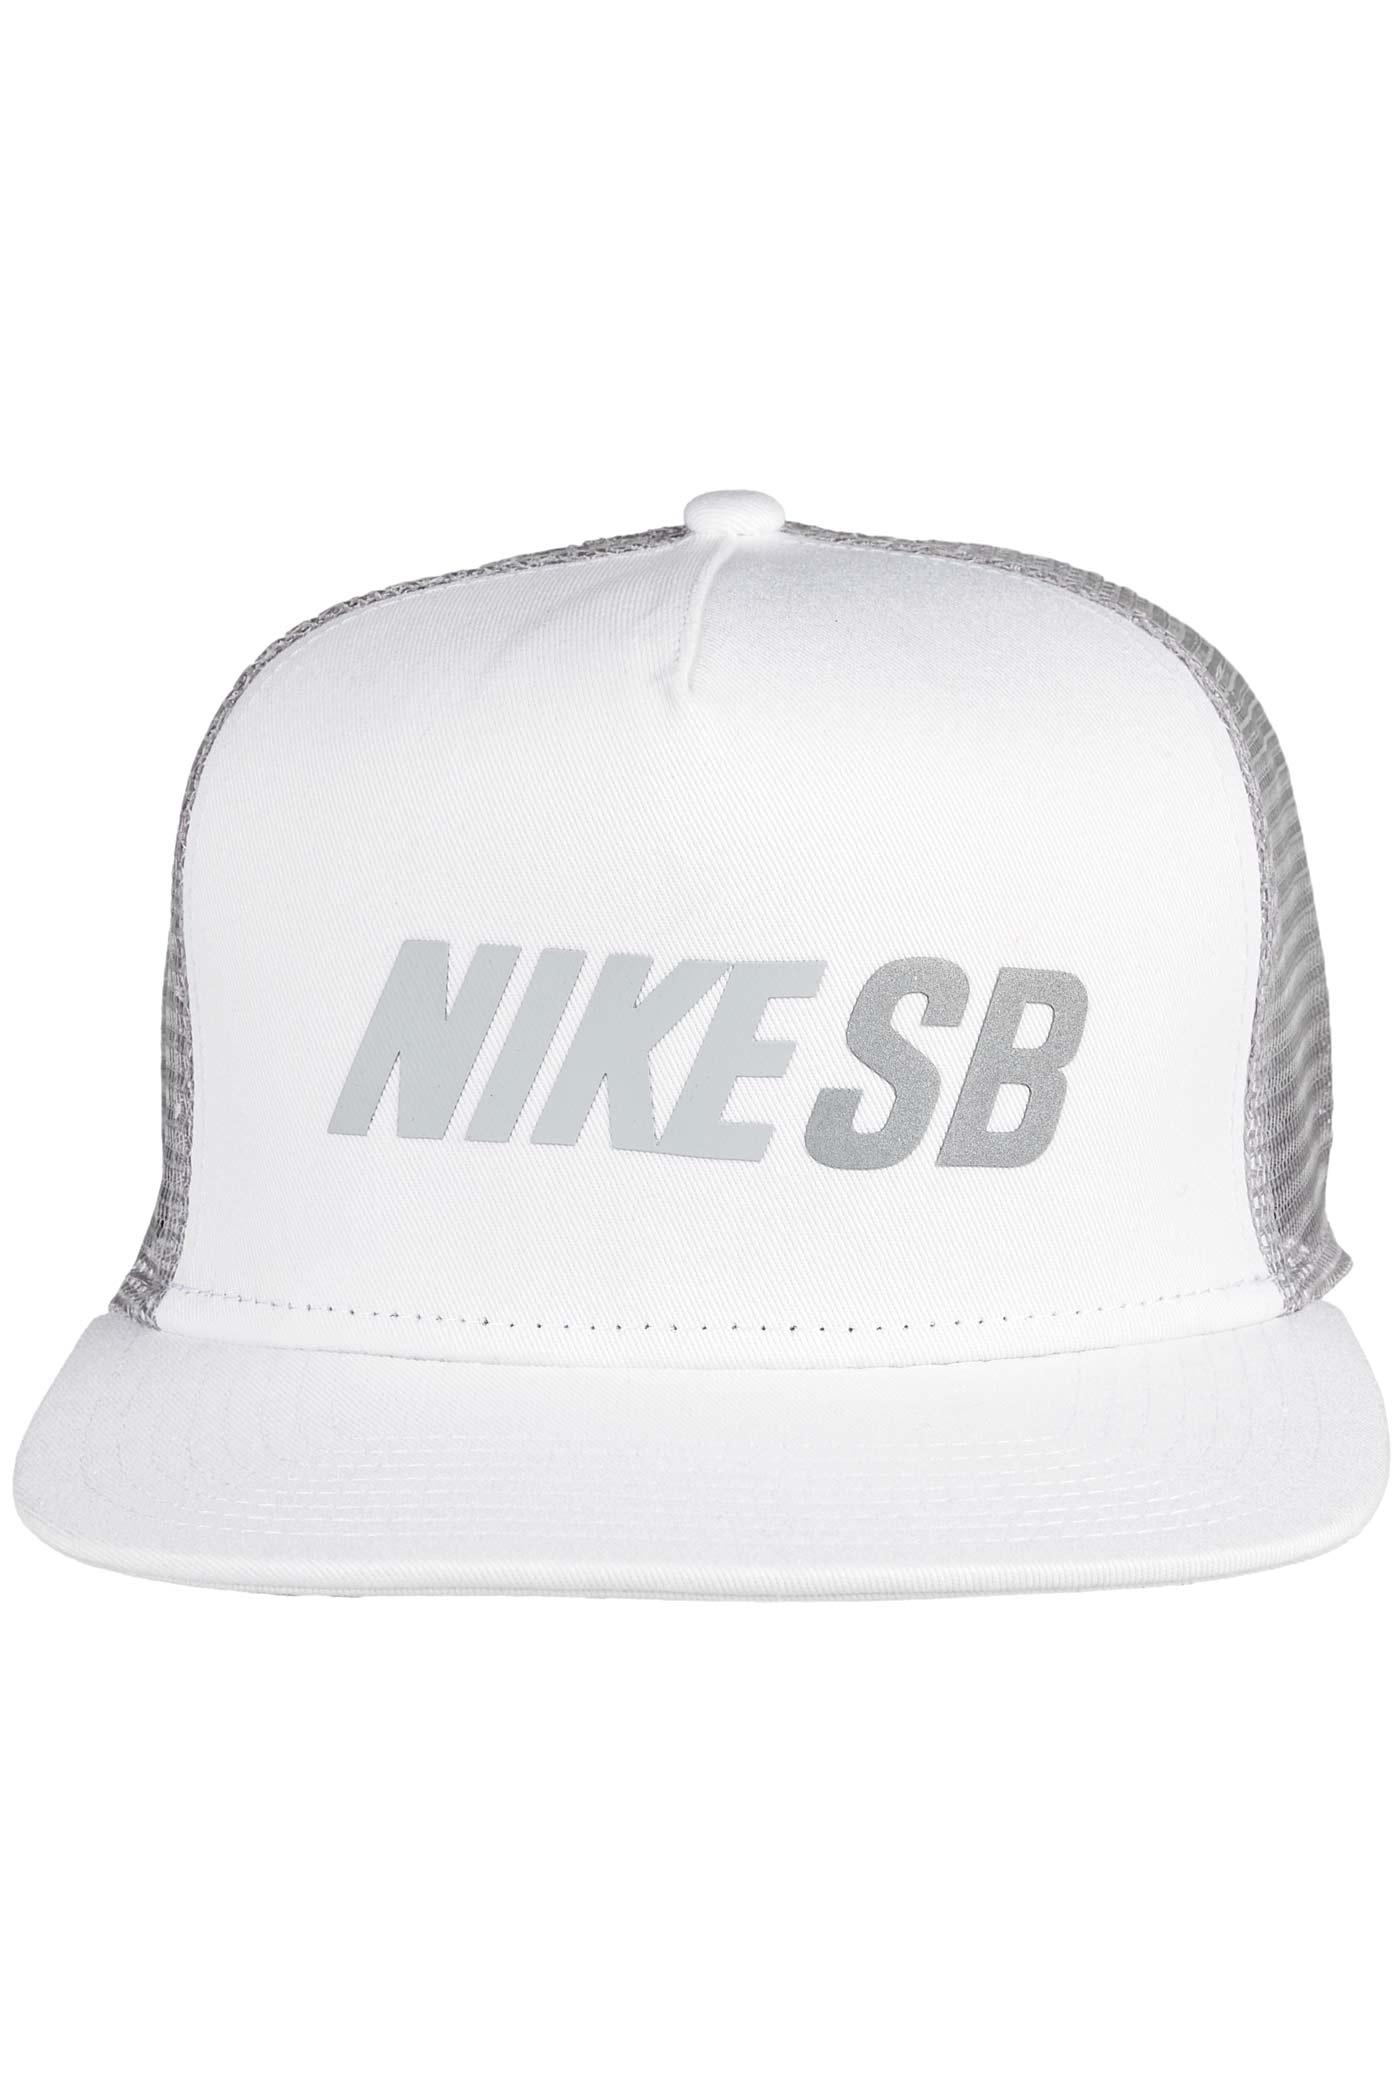 nike shox tl - Nike SB Reflect Trucker Casquette (white wolf grey) achetez sur ...